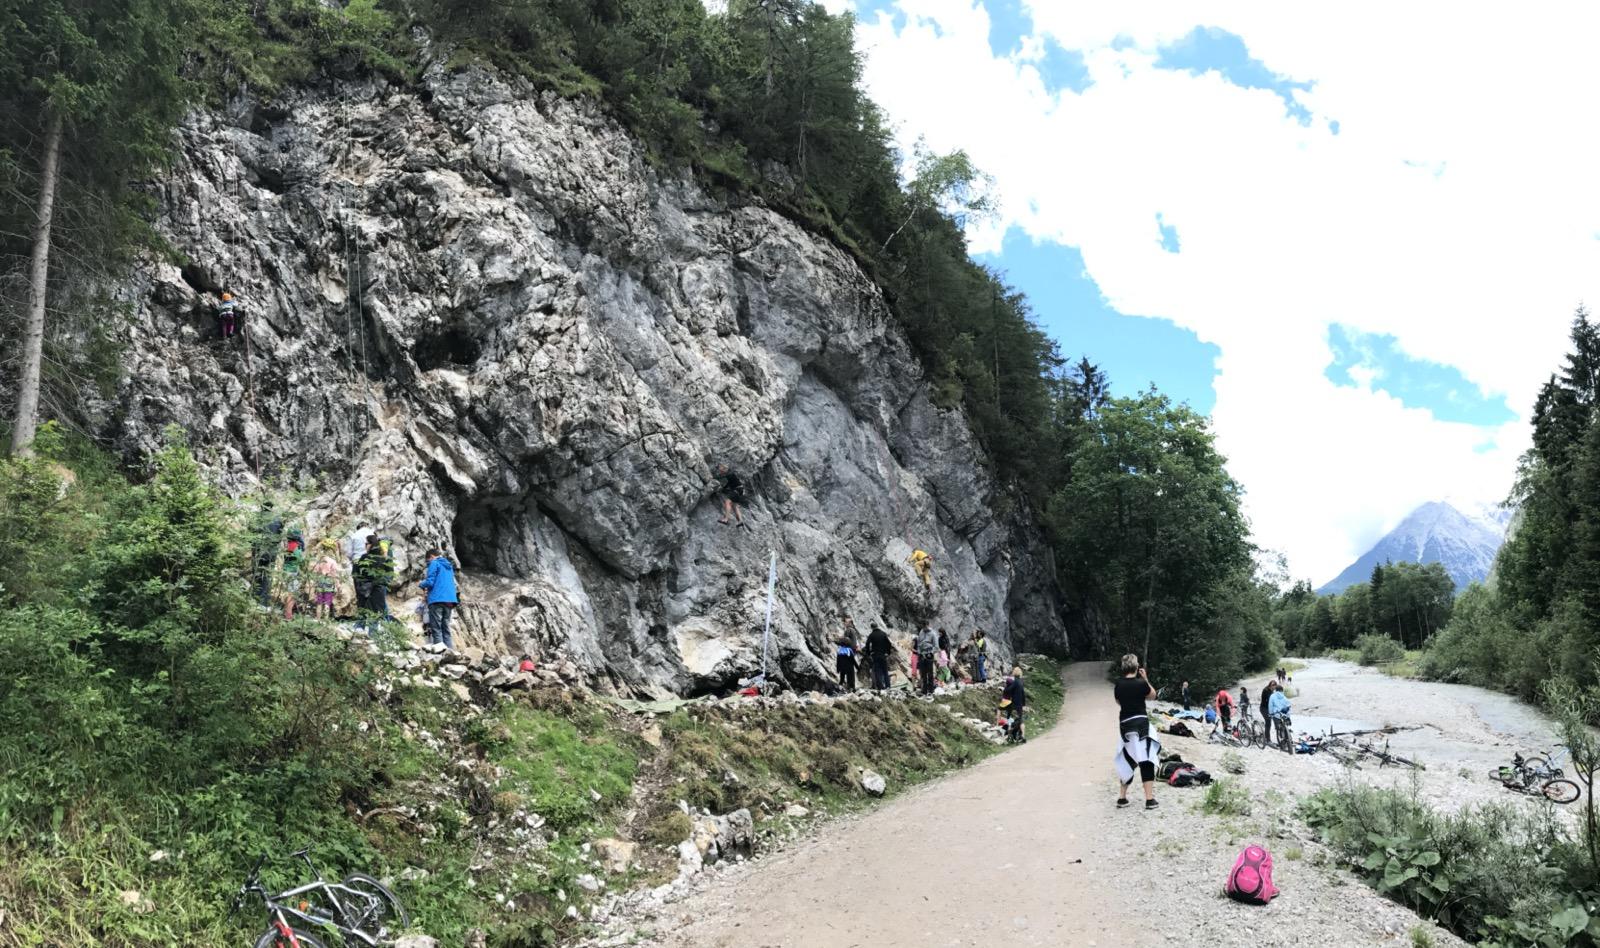 Seefeld, Klettergarten Flämenwandl, Foto: Olympiaregion Seefeld I Climbers Paradise